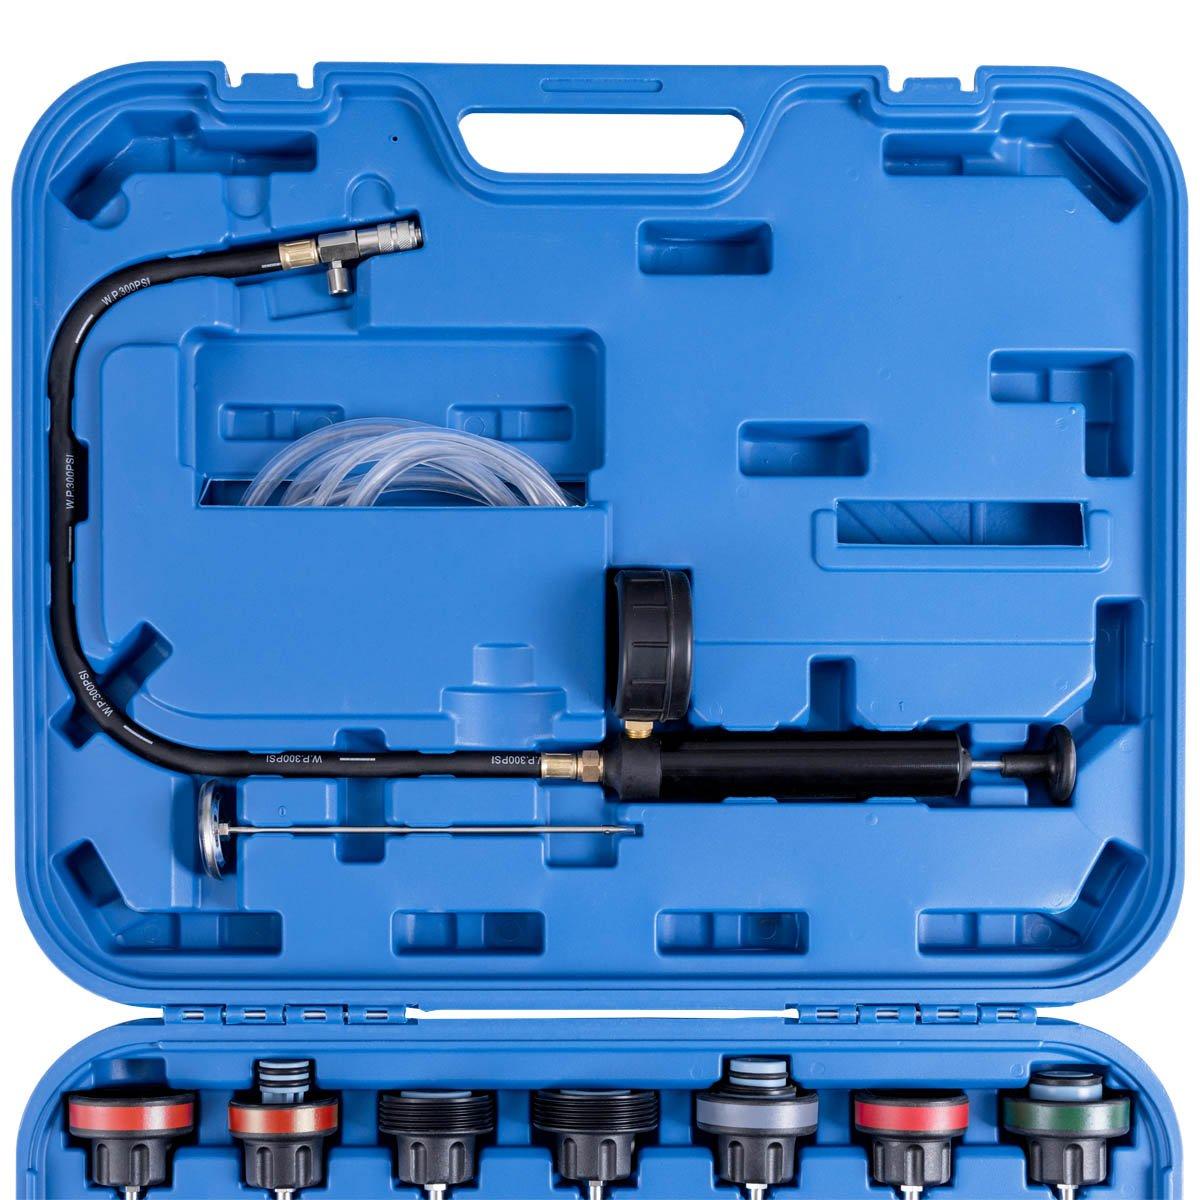 Goplus 28PCS Universal Radiator Pressure Tester Leak Checker Vacuum Type Cooling System Automotive Radiator Pressure Test Kit Purge and Refill Kit Set w/Carrying Case by Goplus (Image #5)